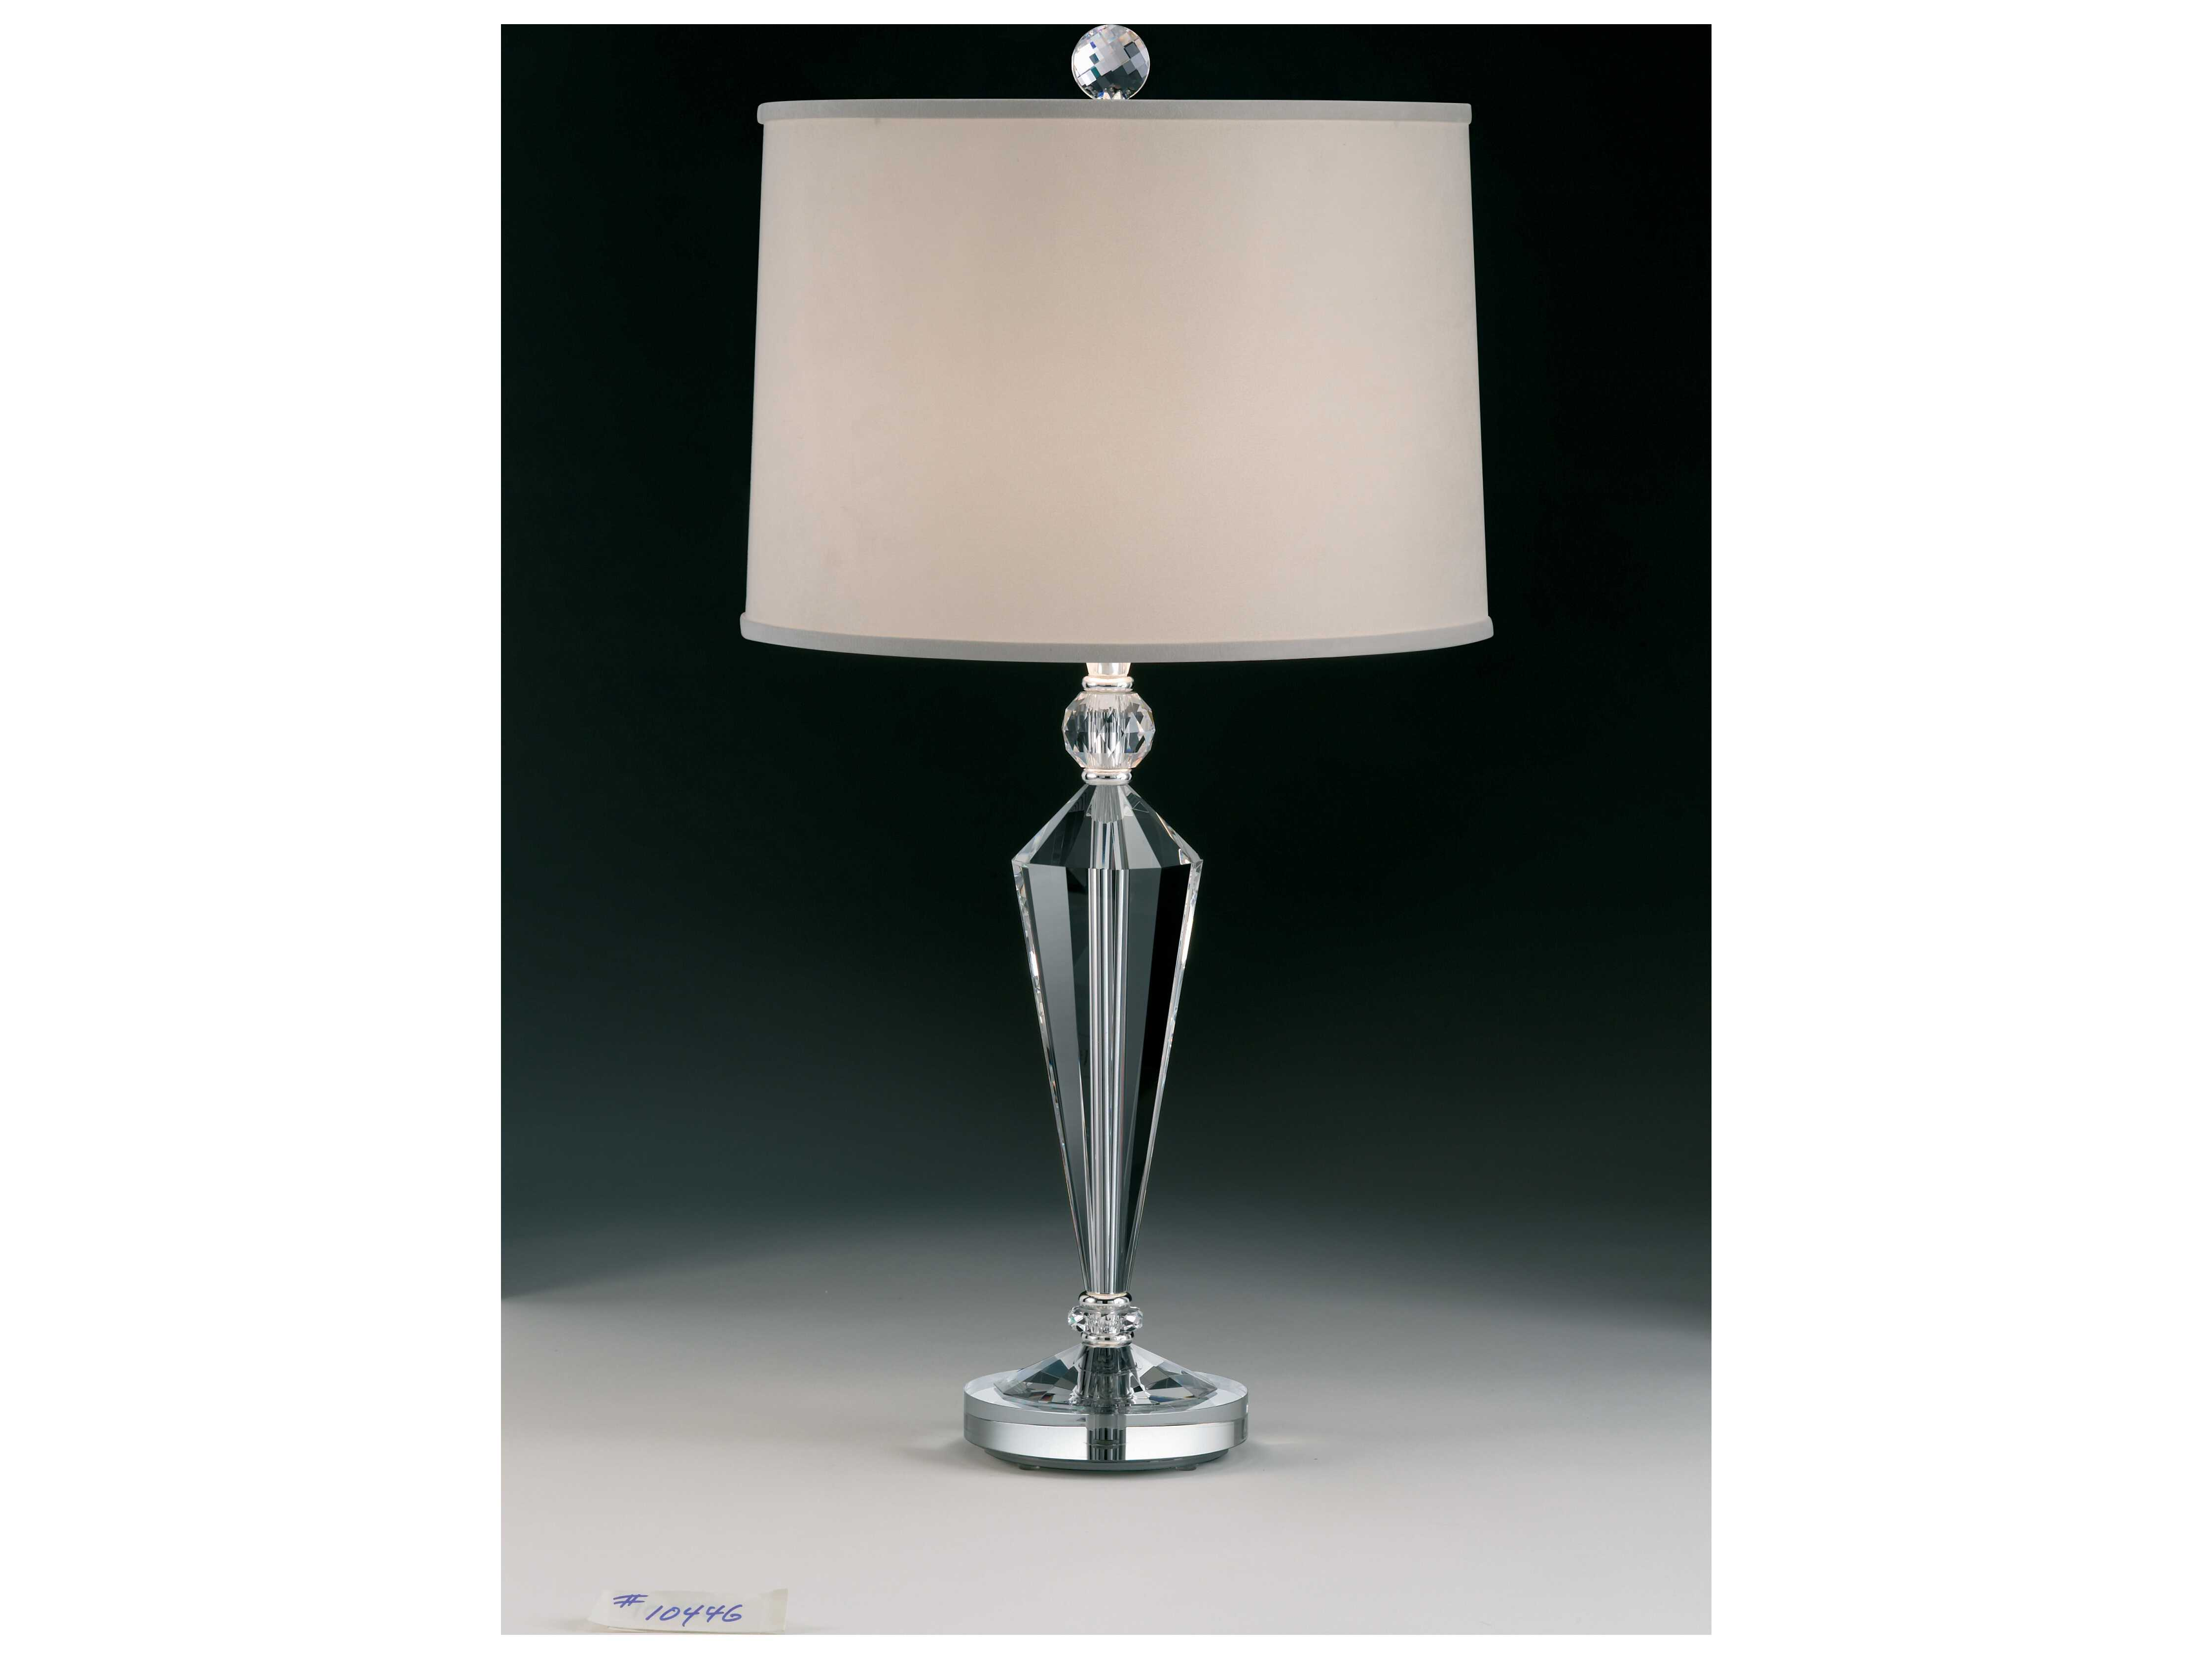 Schonbek Deco Polished Silver Table Lamp 20446